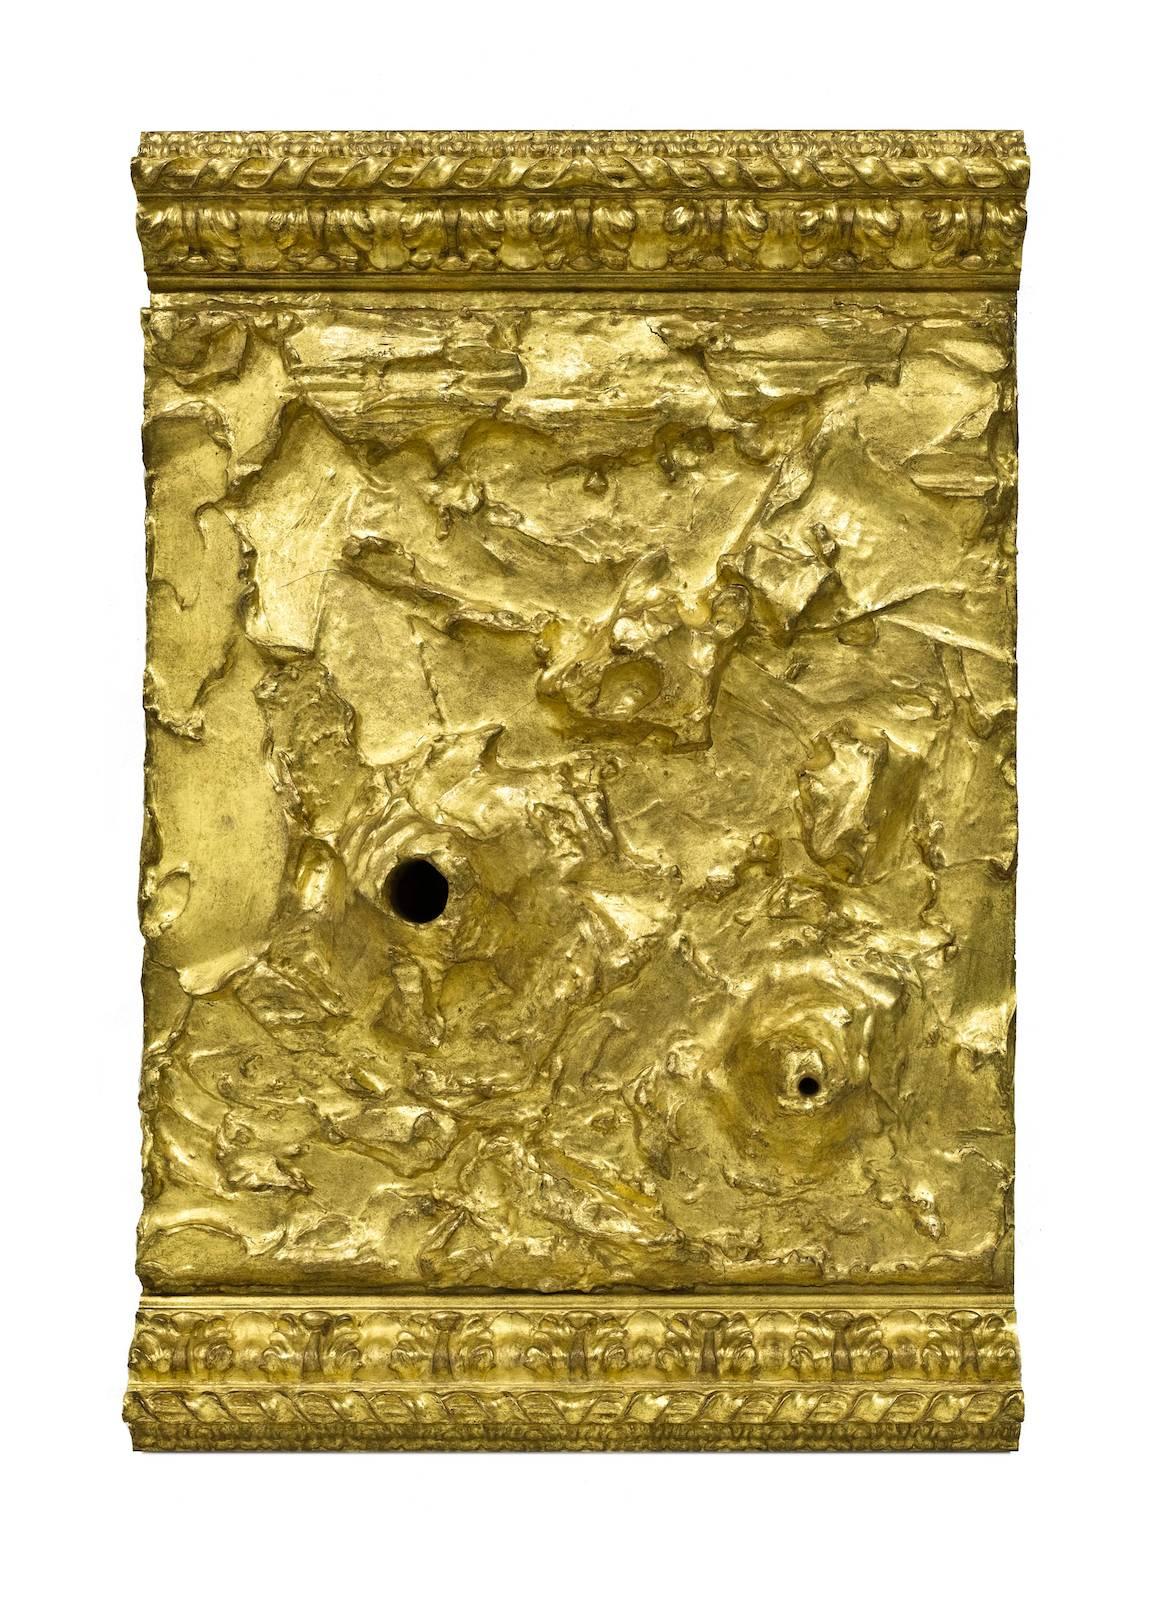 Untitled, 2017, wood, acrylic paste, gold leaf, 74 x 50 x 12 cm